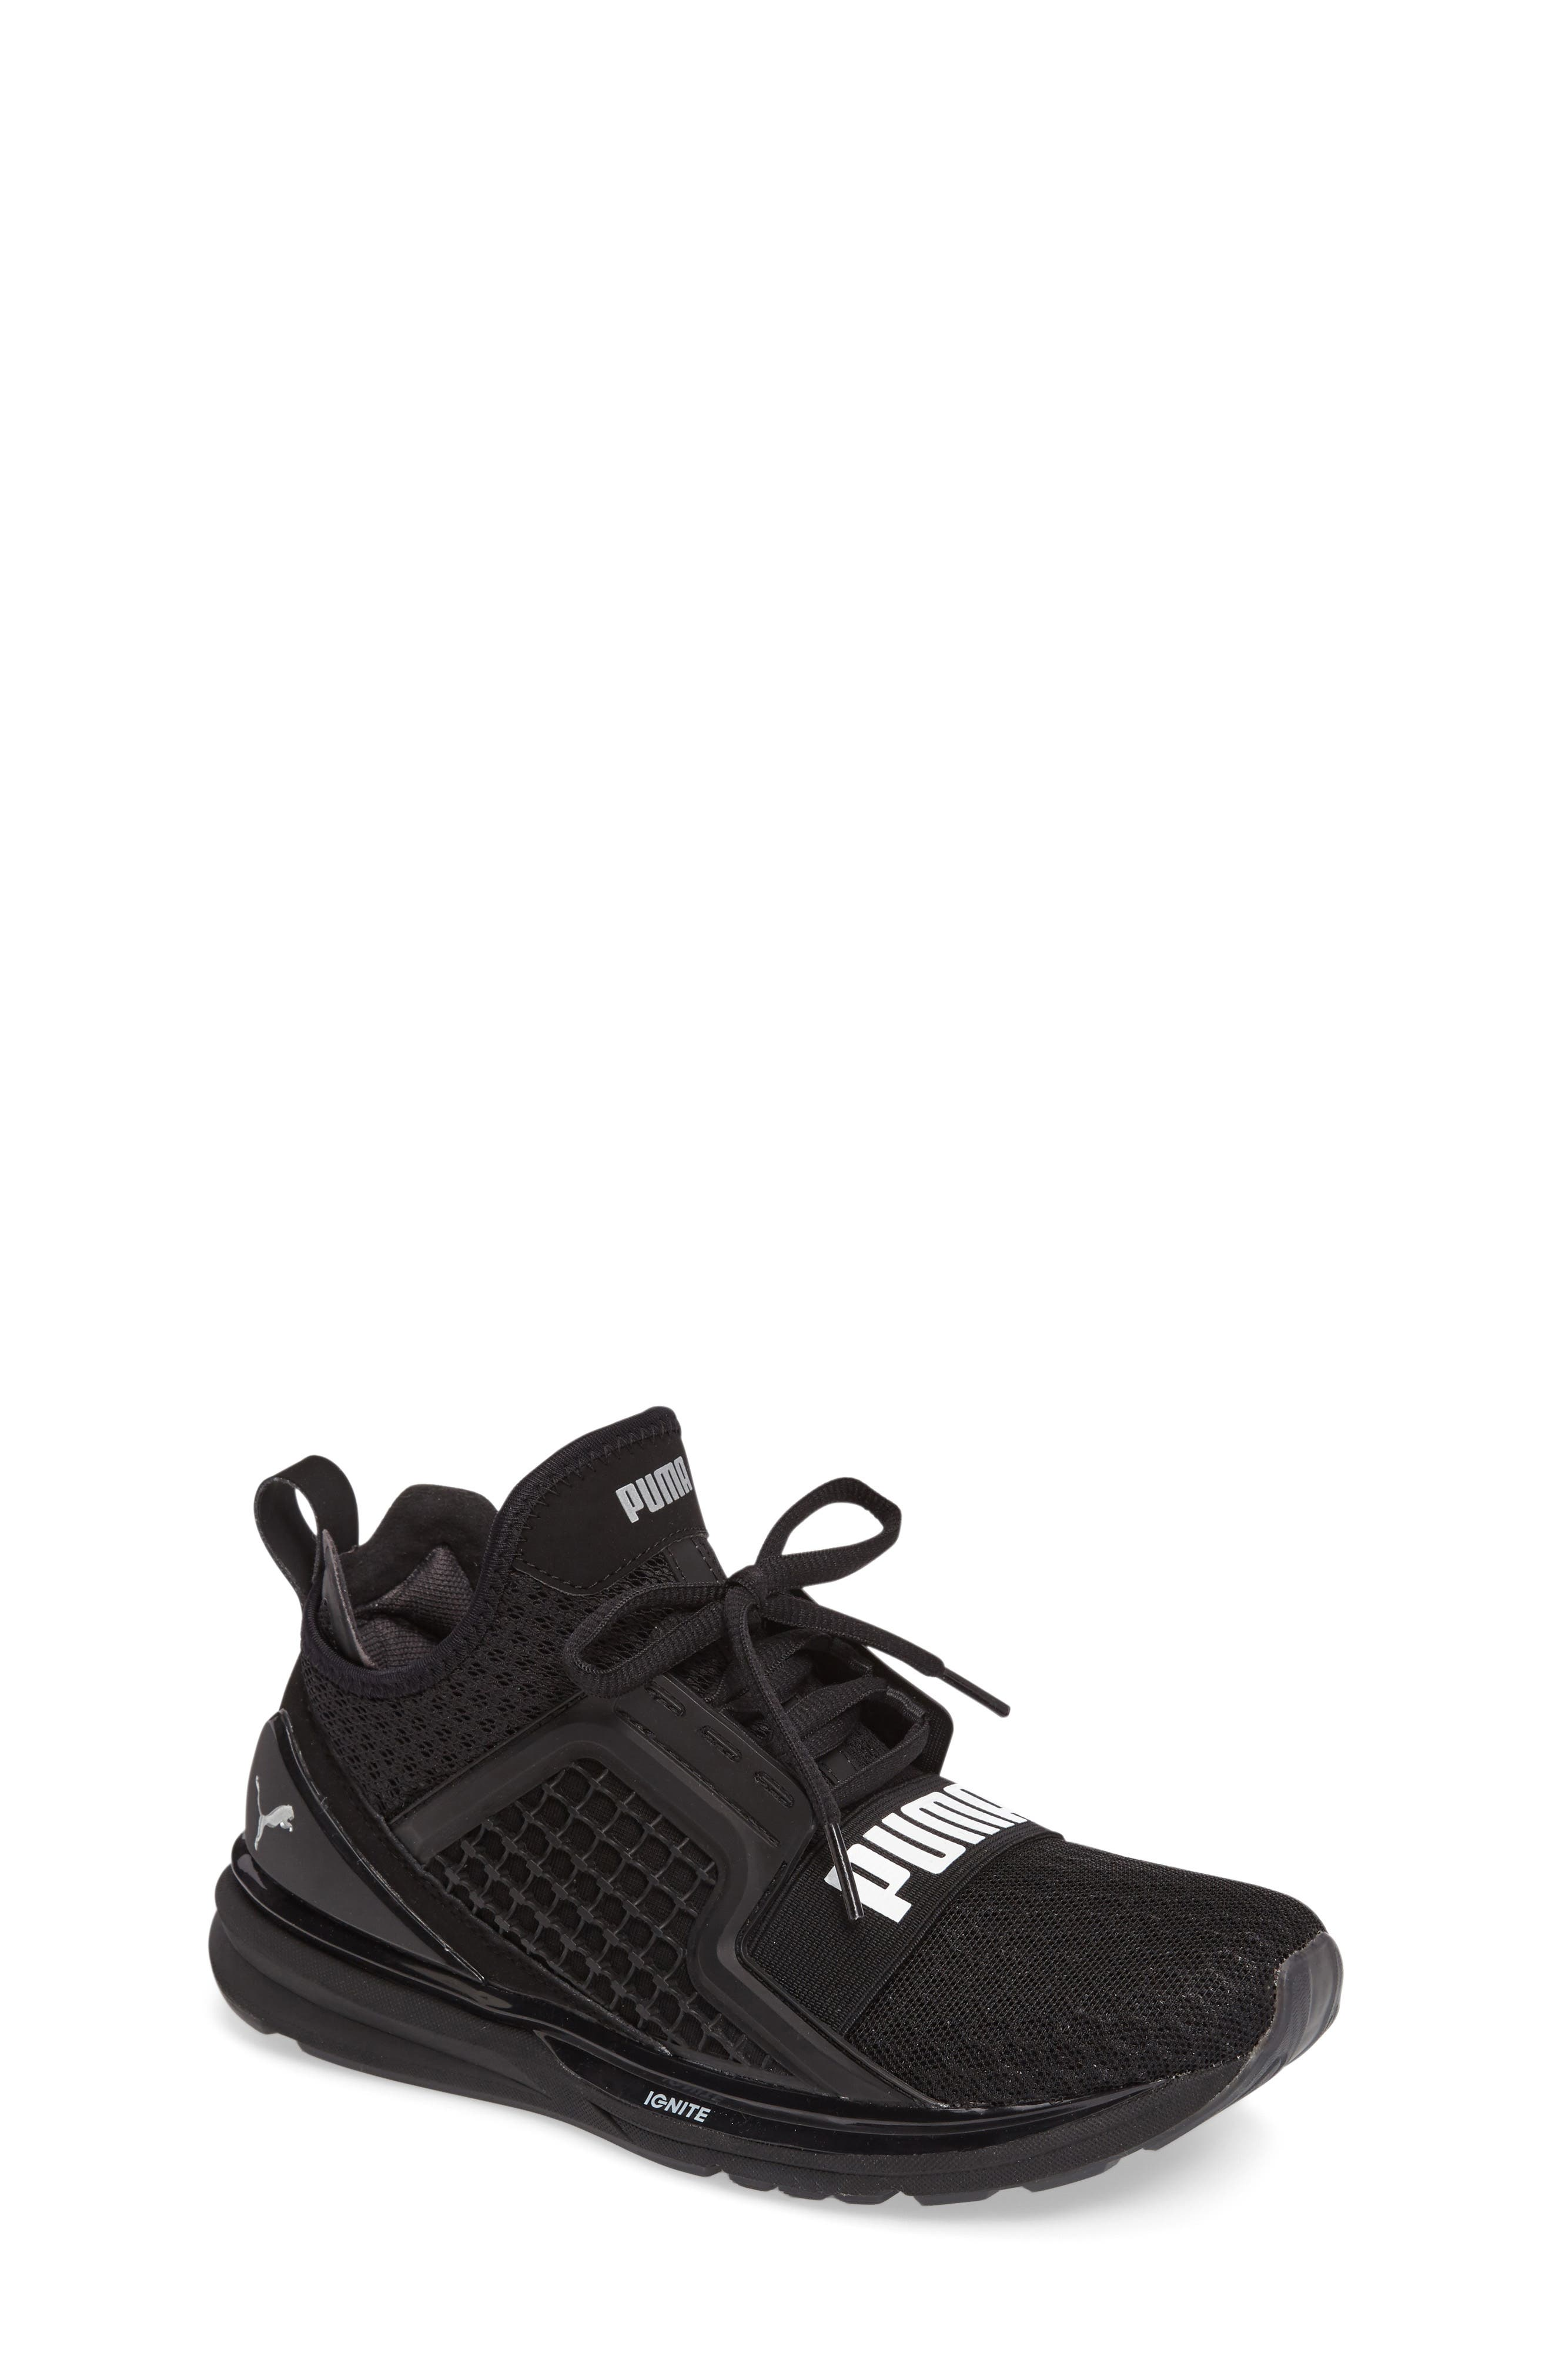 Ignite Limitless Sneaker,                             Main thumbnail 1, color,                             001